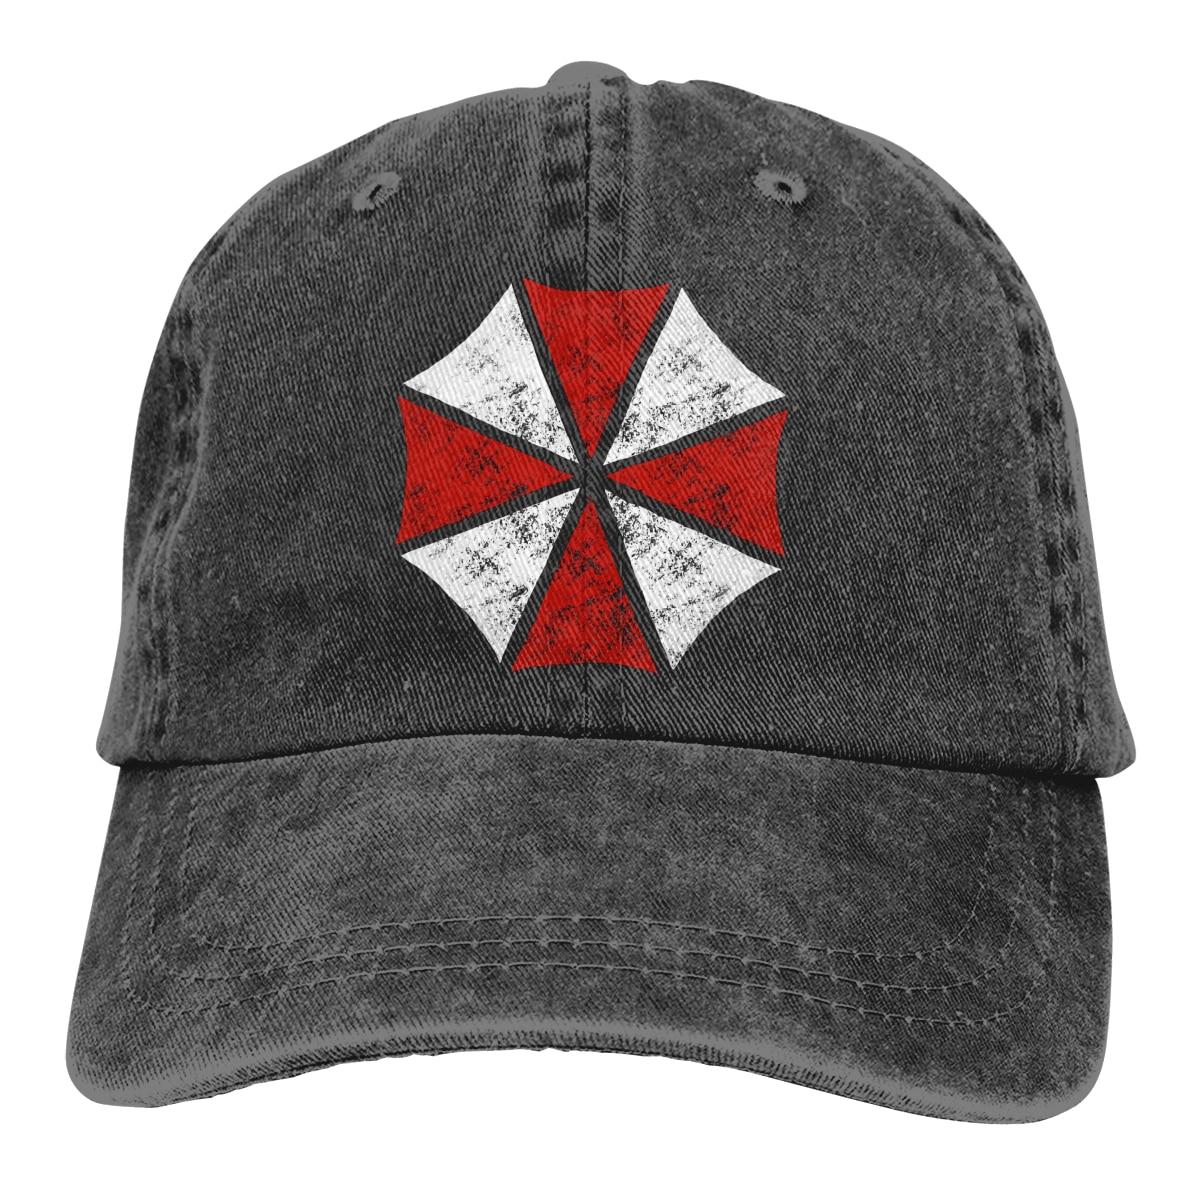 Umbrella Wholesale Cotton Baseball Cap Men Women Residented Evil Dad Mesh Hat Trucker Dropshipping Outdoor